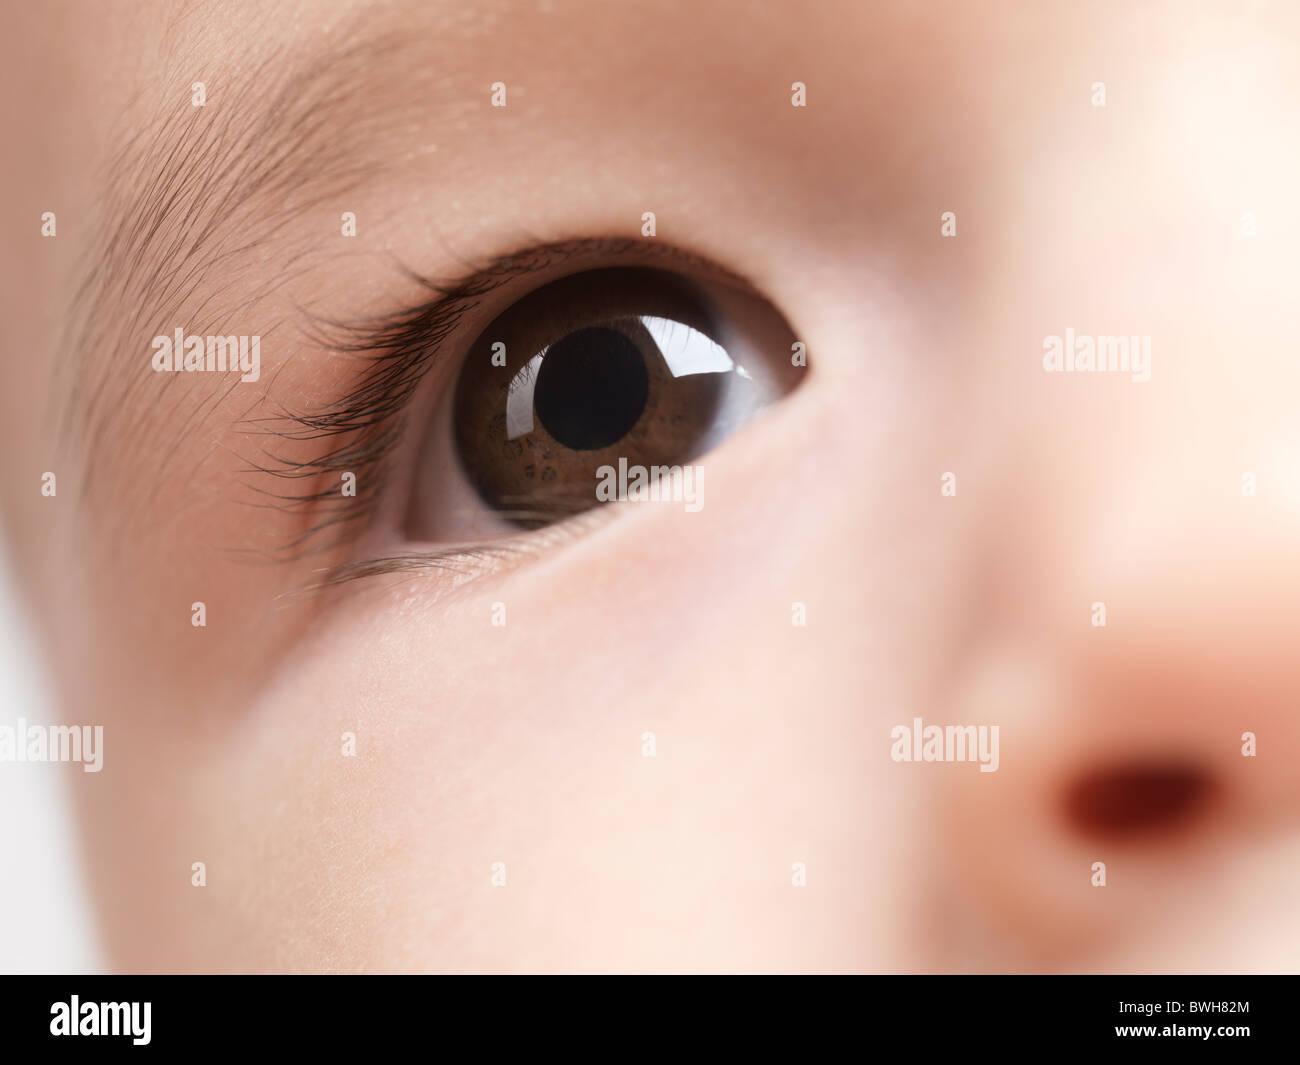 Nahaufnahme des Auges ein sechs Monate altes Baby boy Stockbild